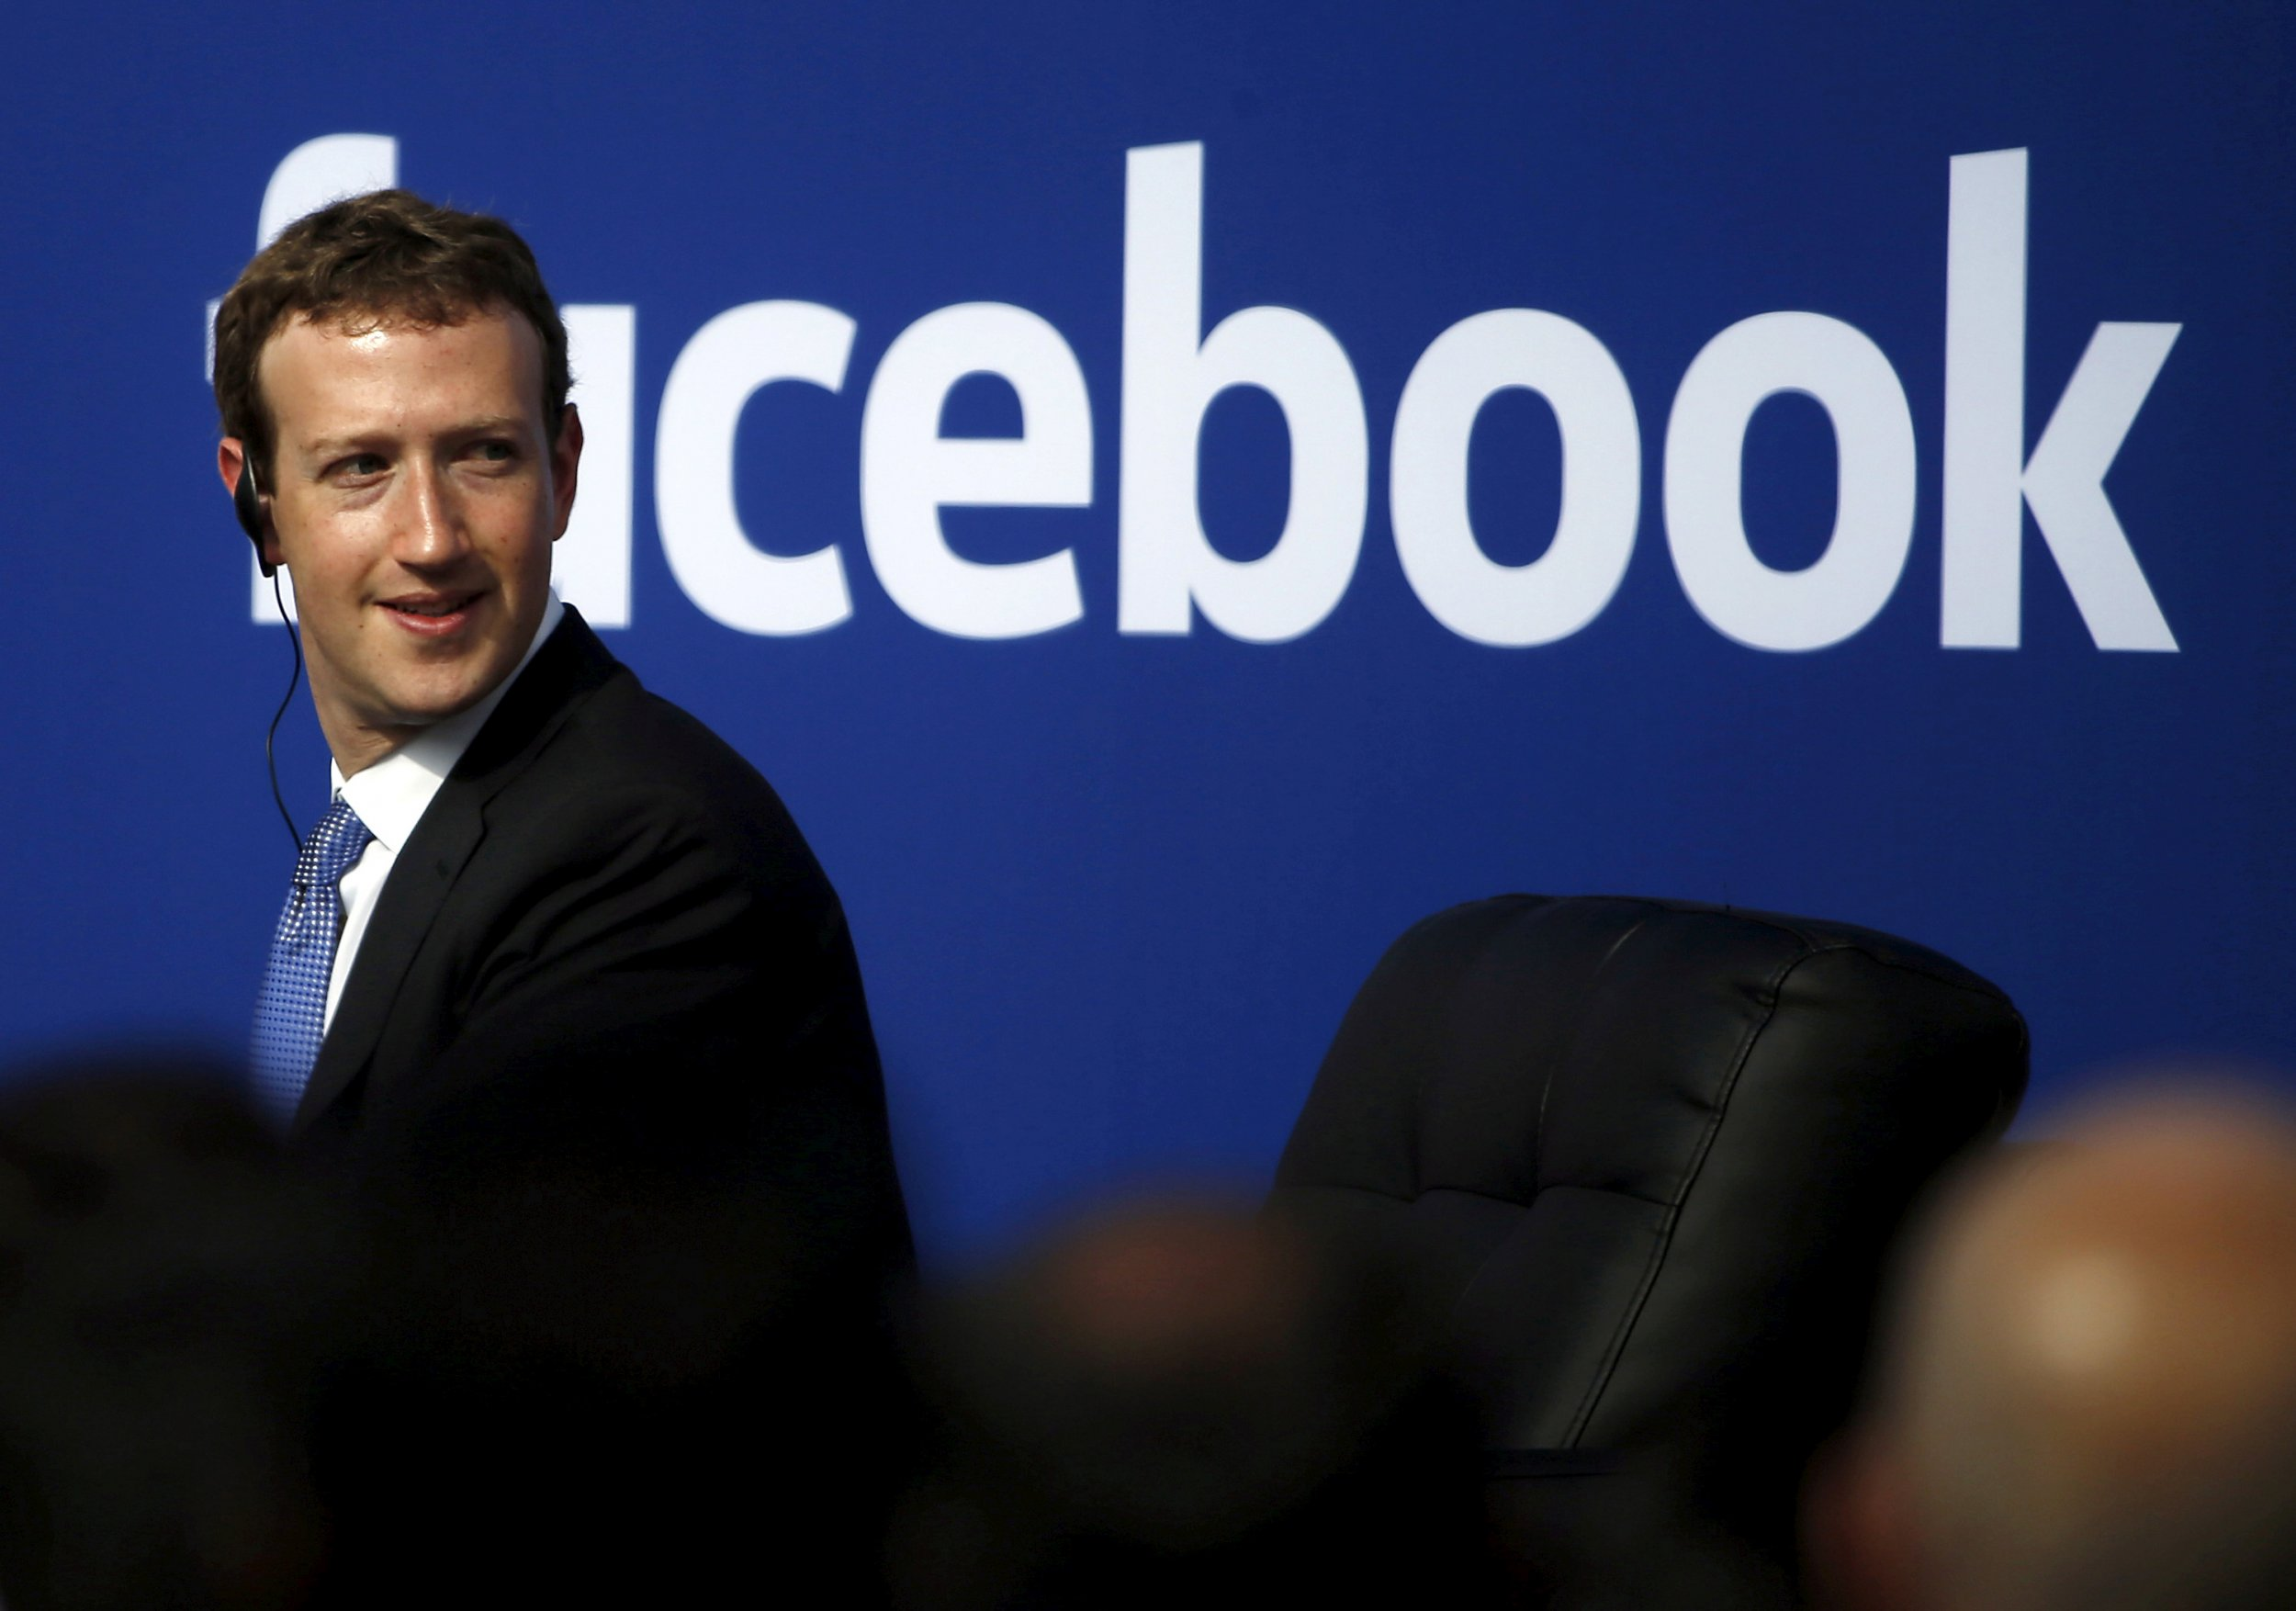 Facebook Growth Earned Mark Zuckerberg $6 Billion in 2016